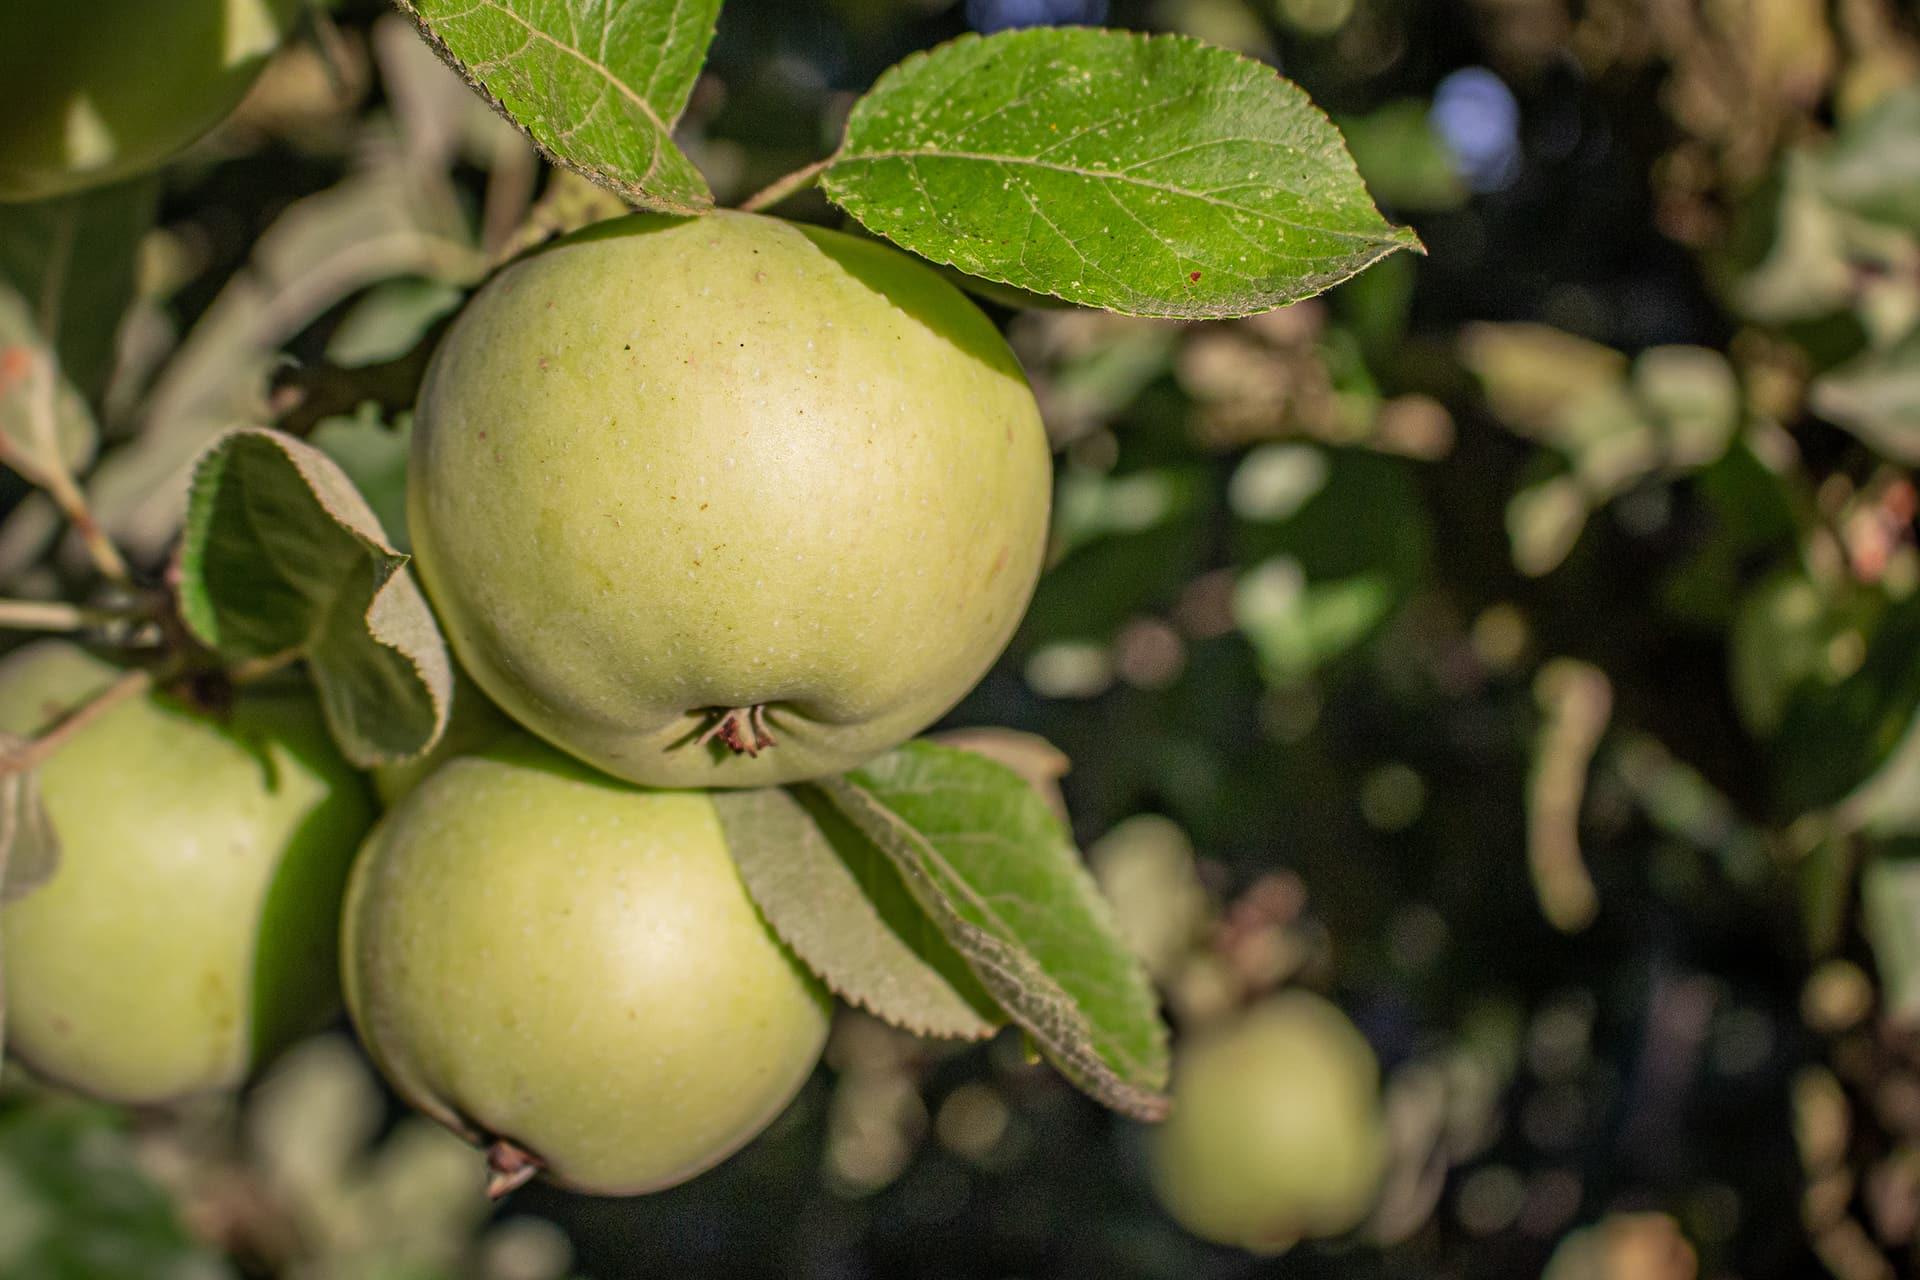 Manzanas para la sidra Carral: morro de liebre